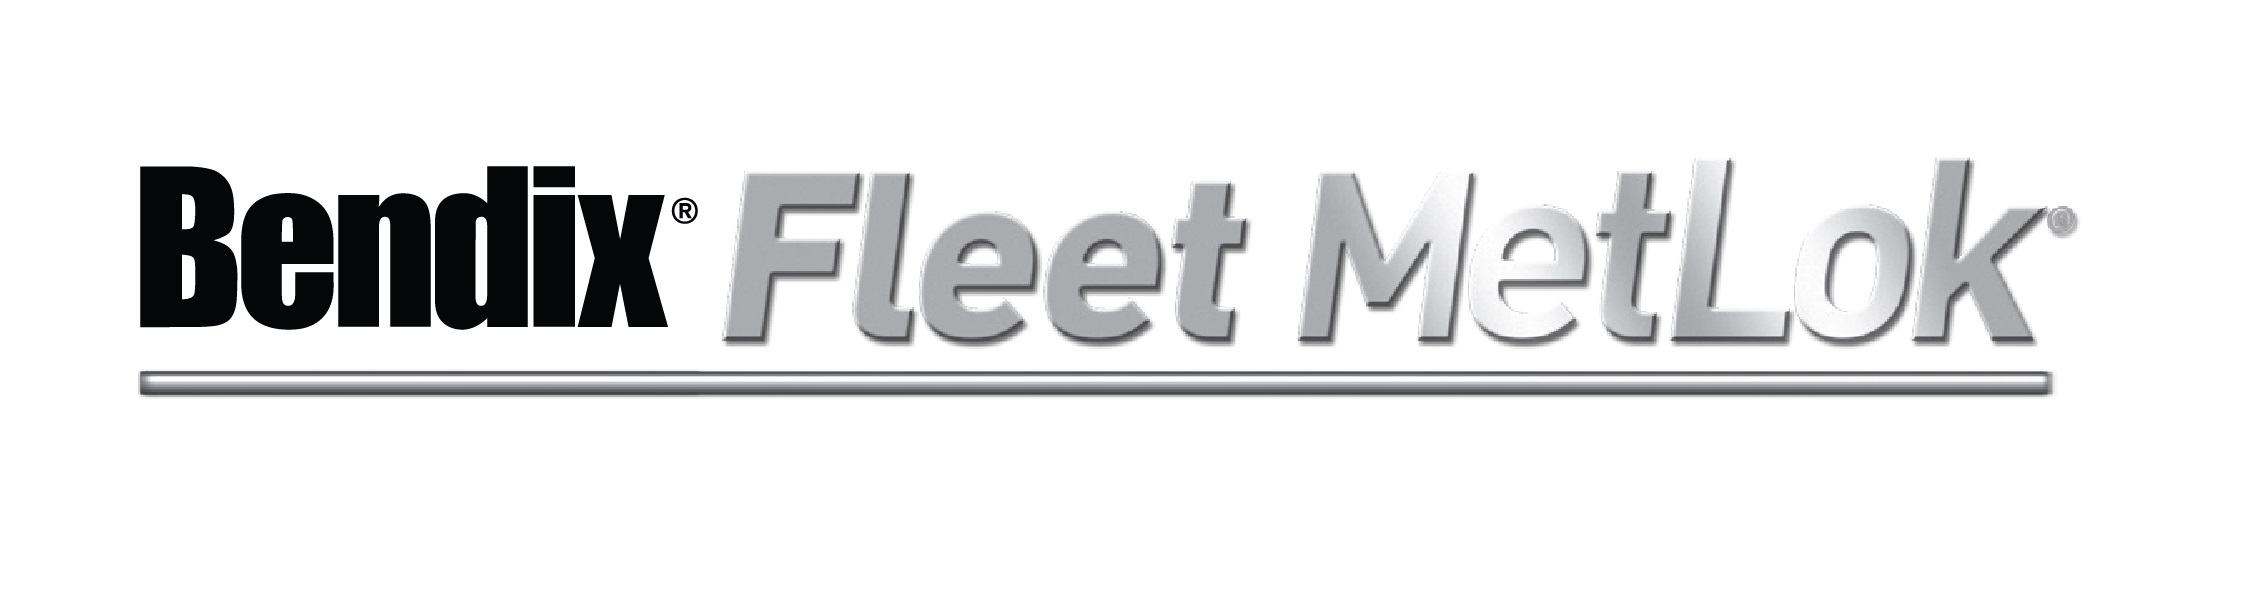 BENDIX FLEET METLOK - Fleet Metlok Semi-Metallic SDR Disc Brake Pad - BFM MKD827FM